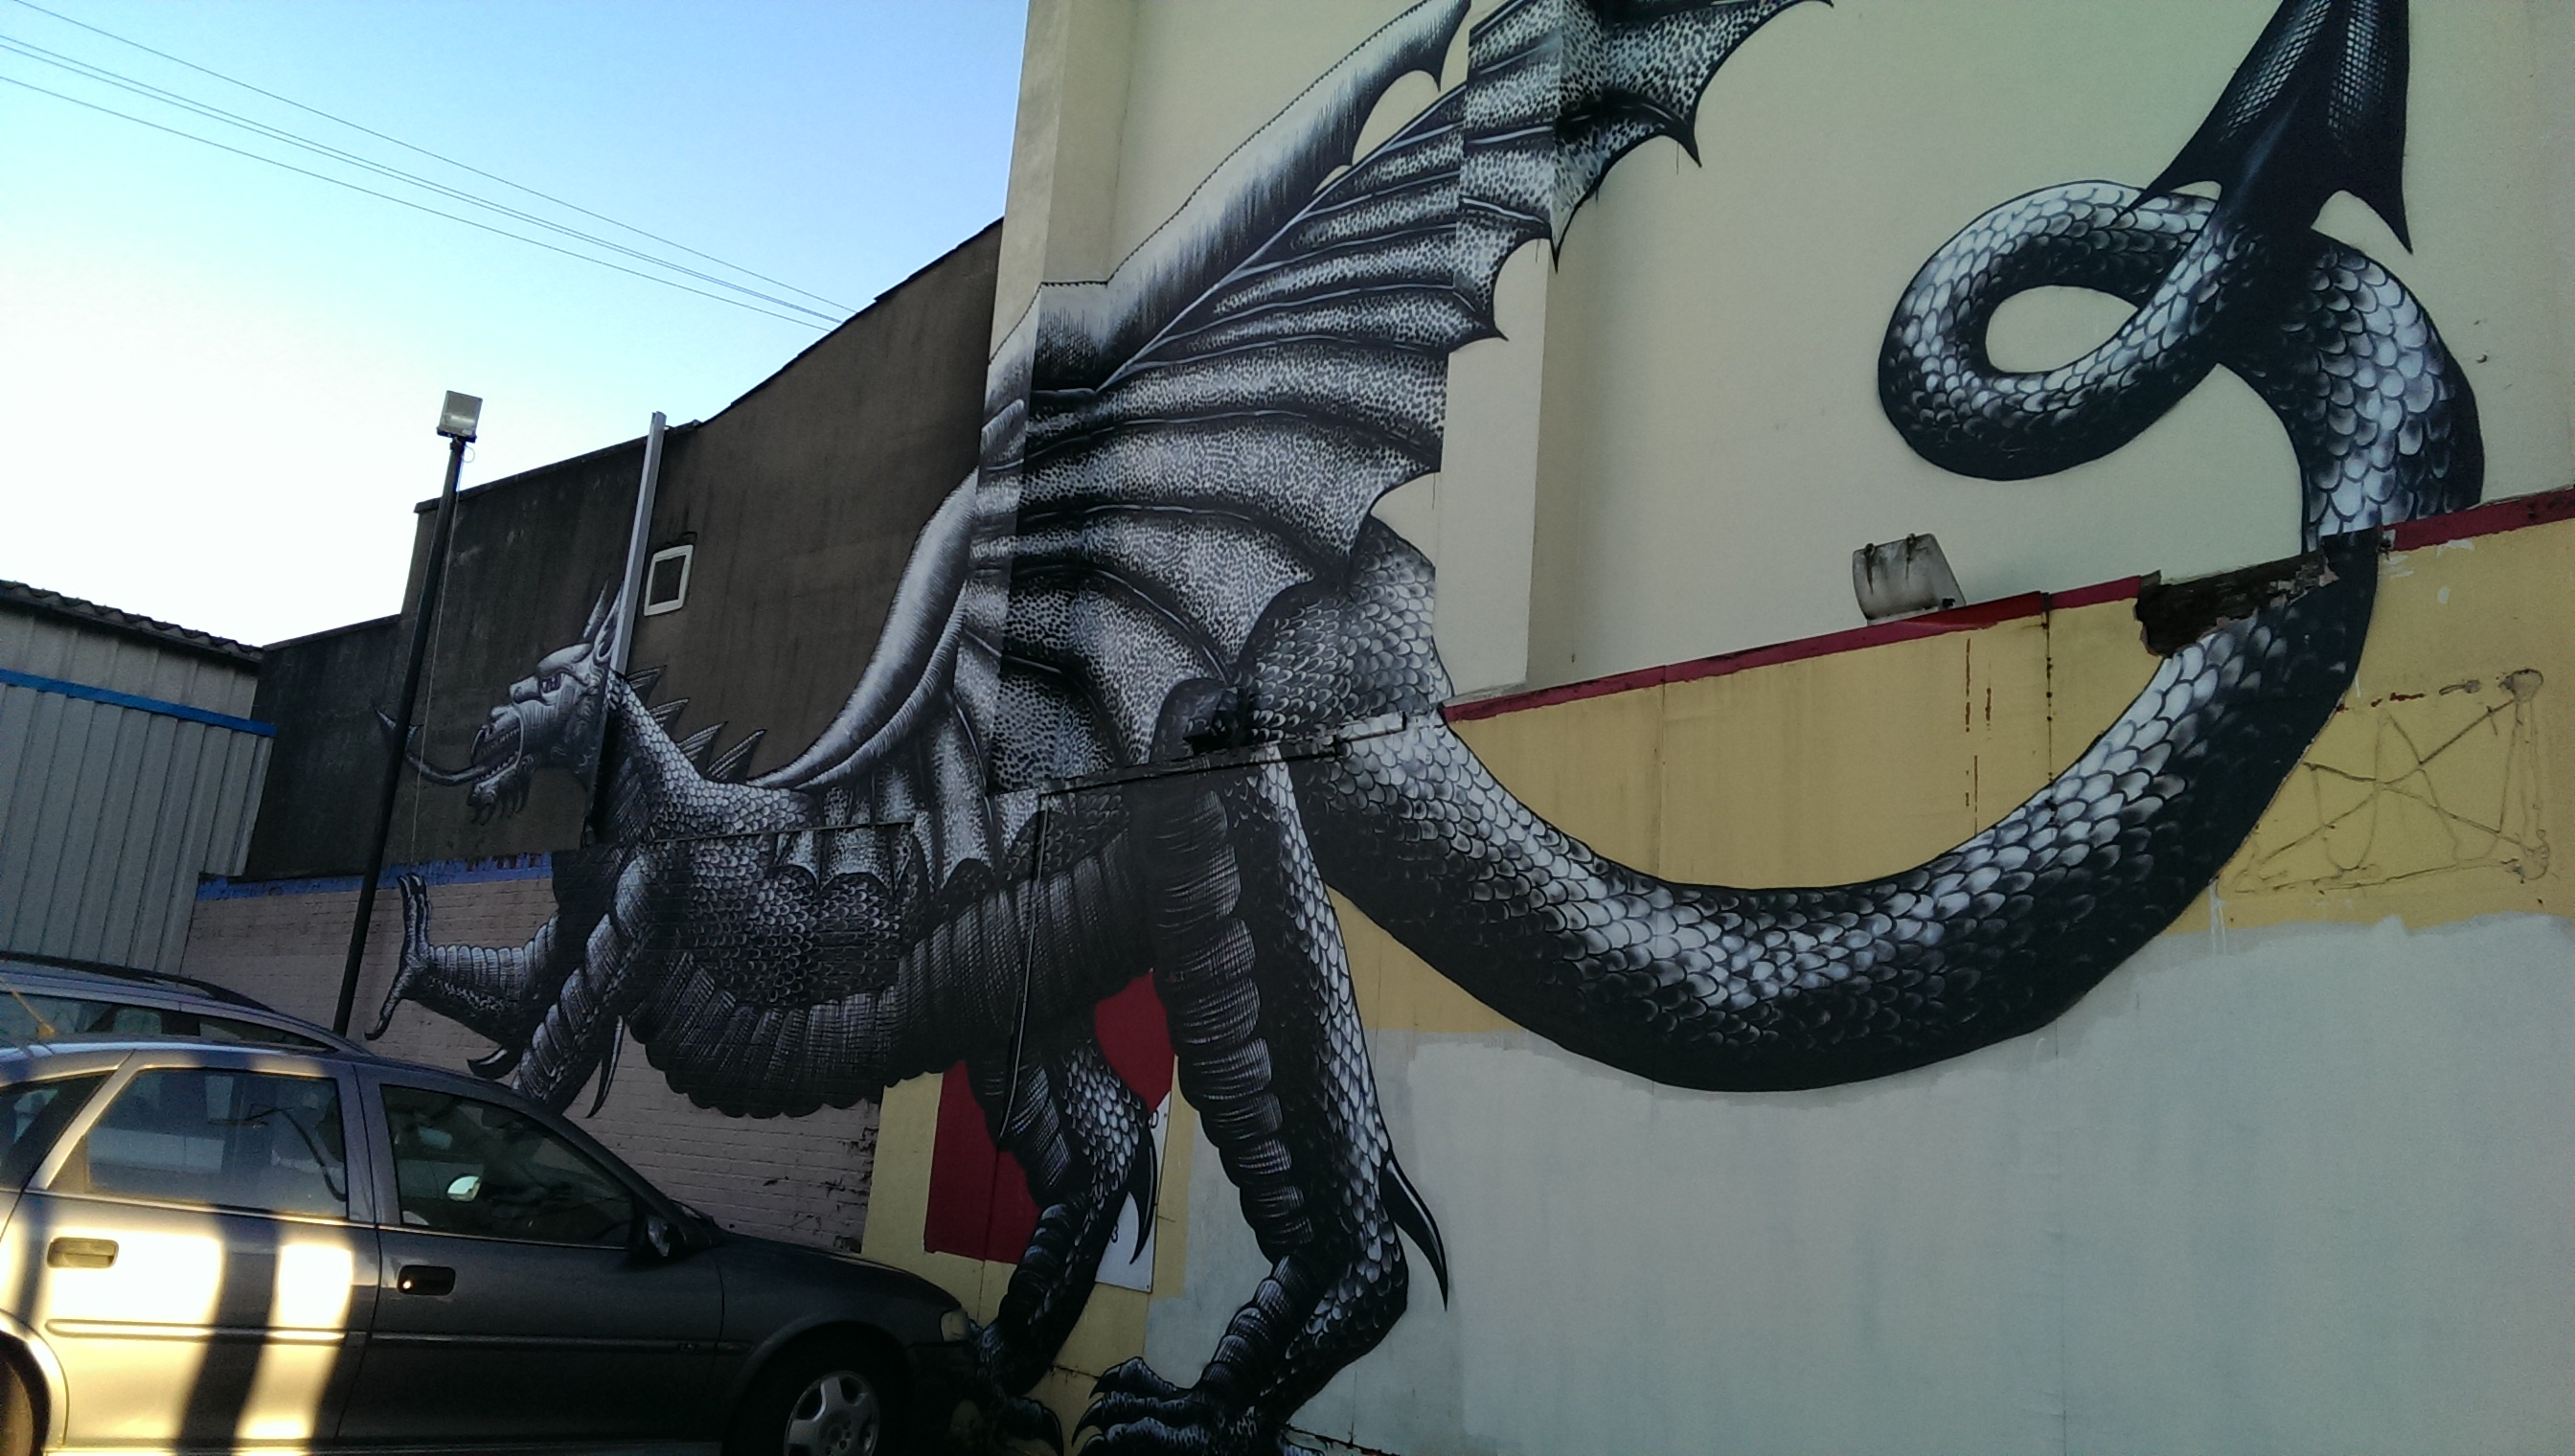 1. b) City Road dragon [2]